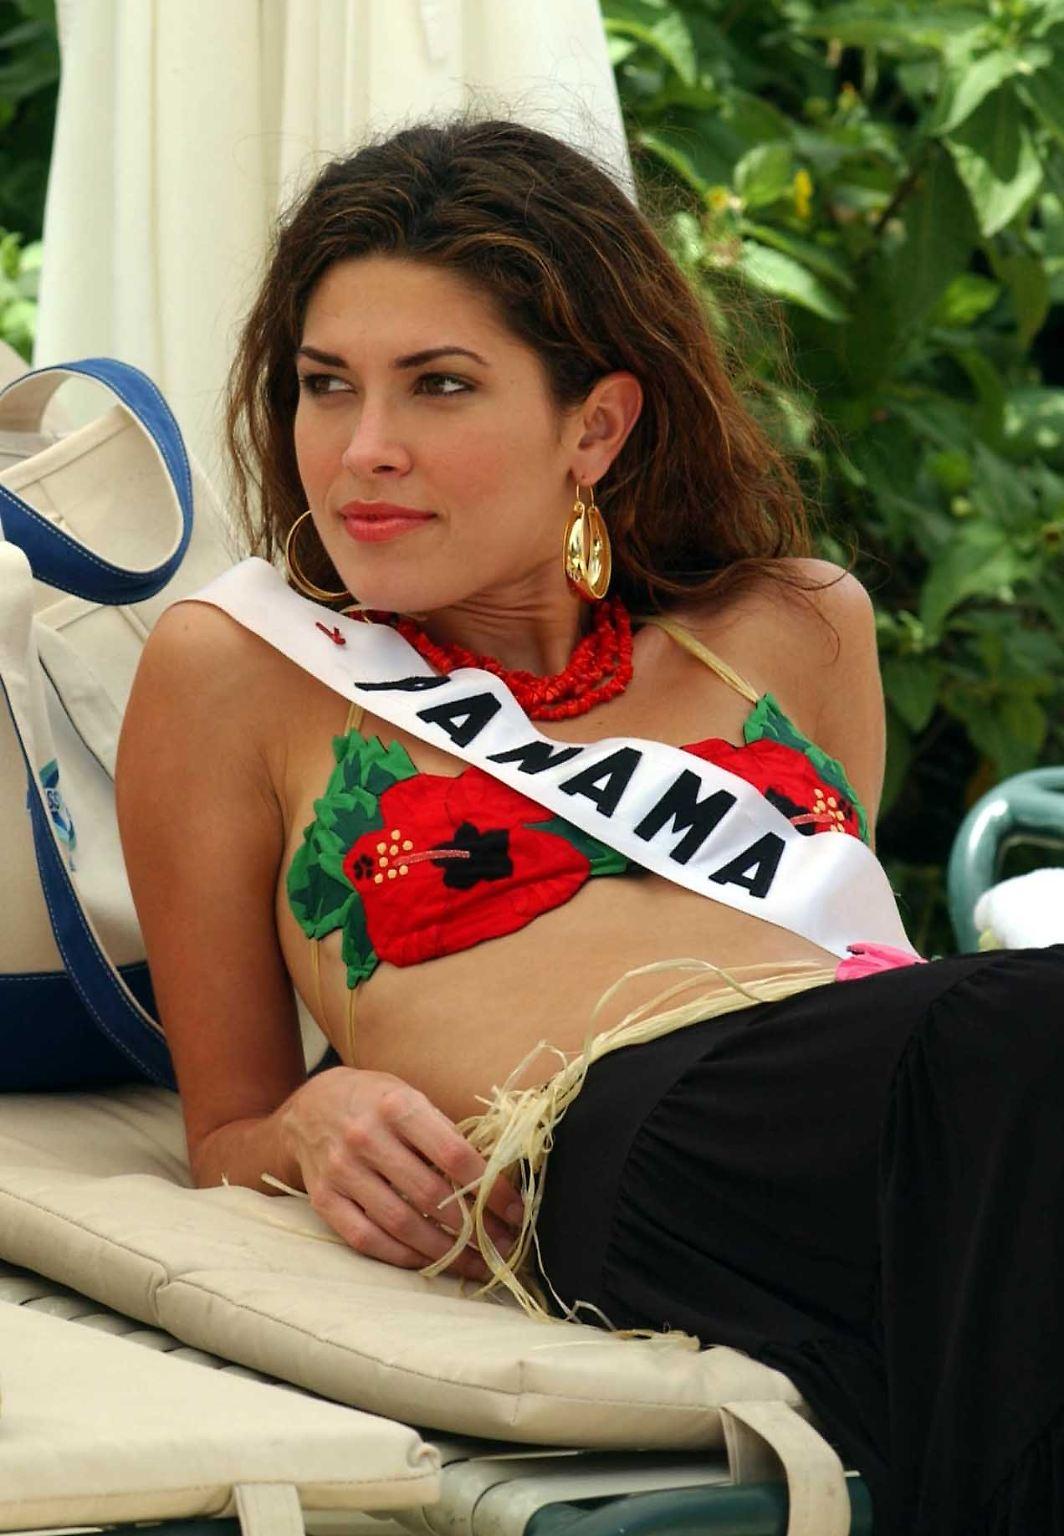 miss panama 2002.jpg